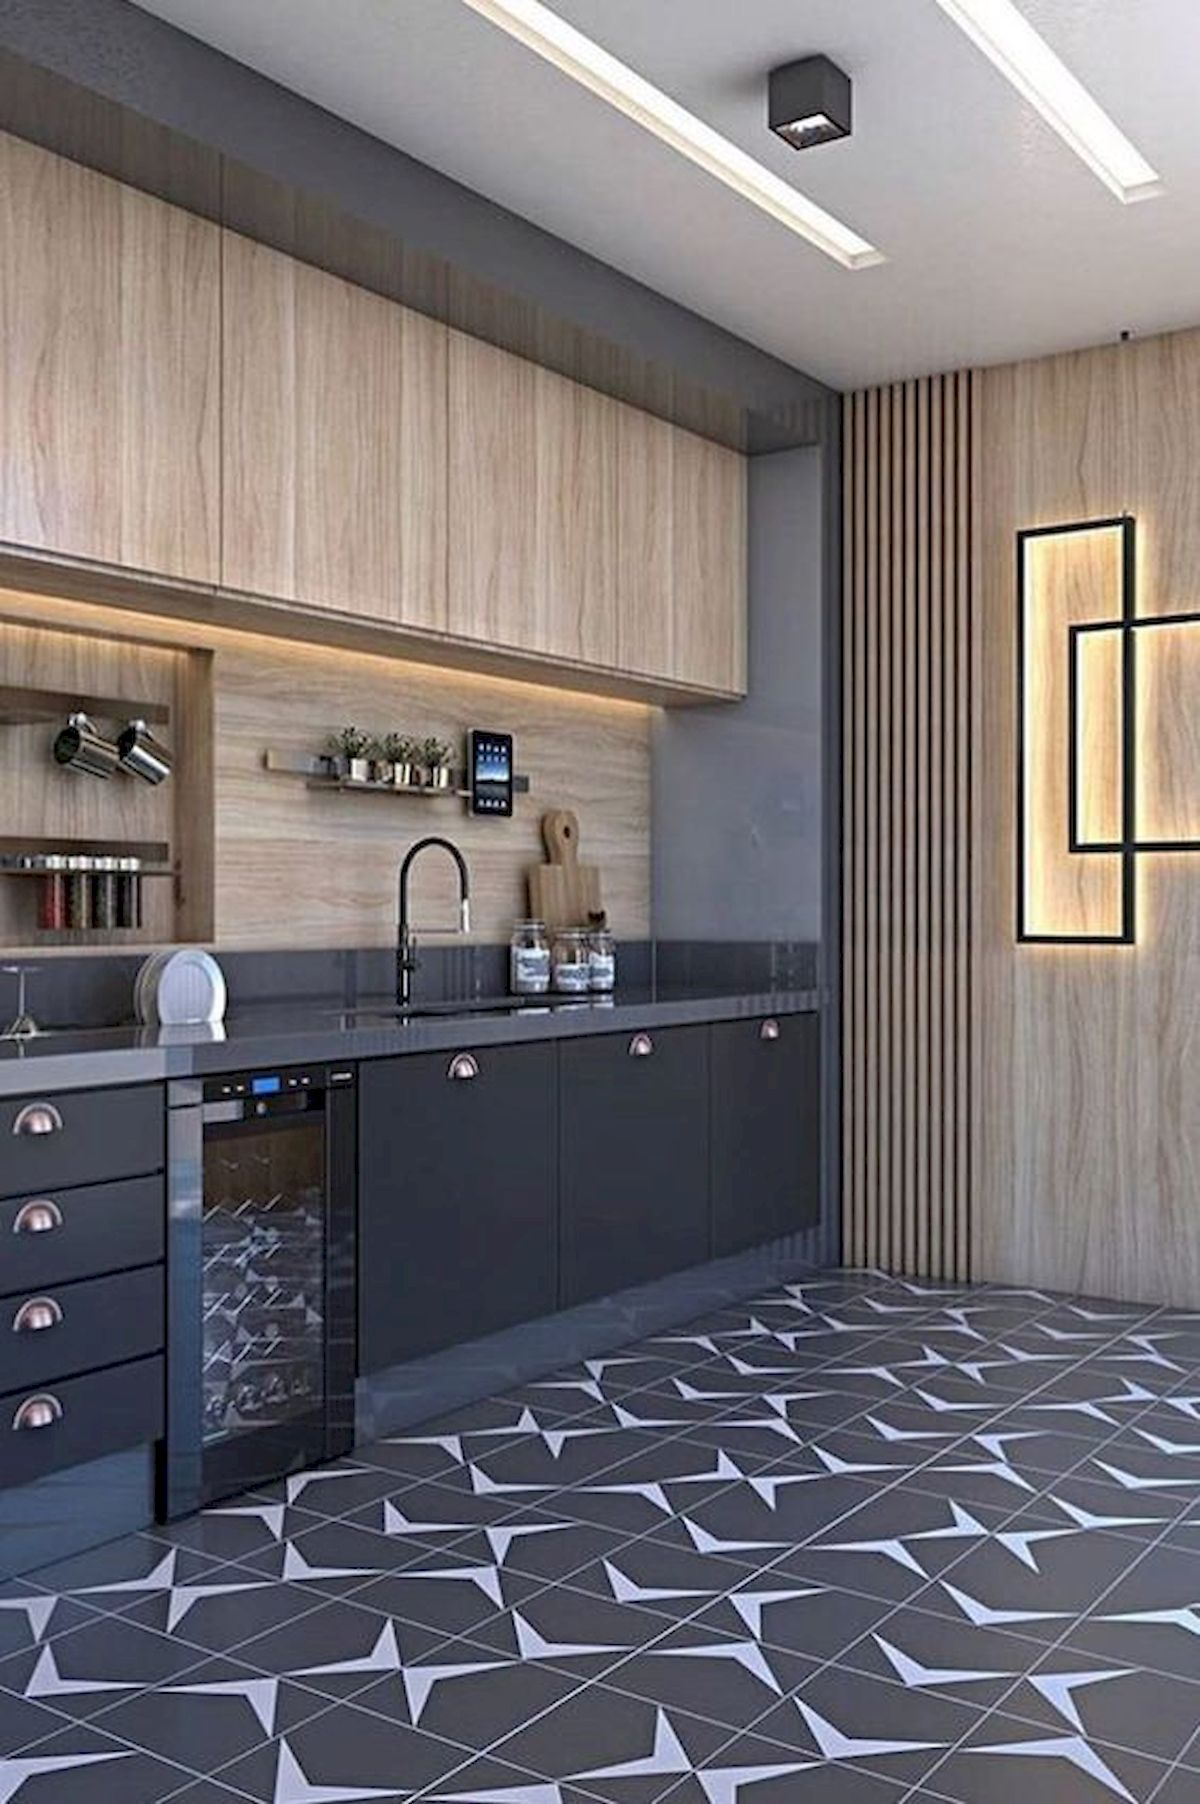 45 Easy Kitchen Decor and Design Ideas (32)